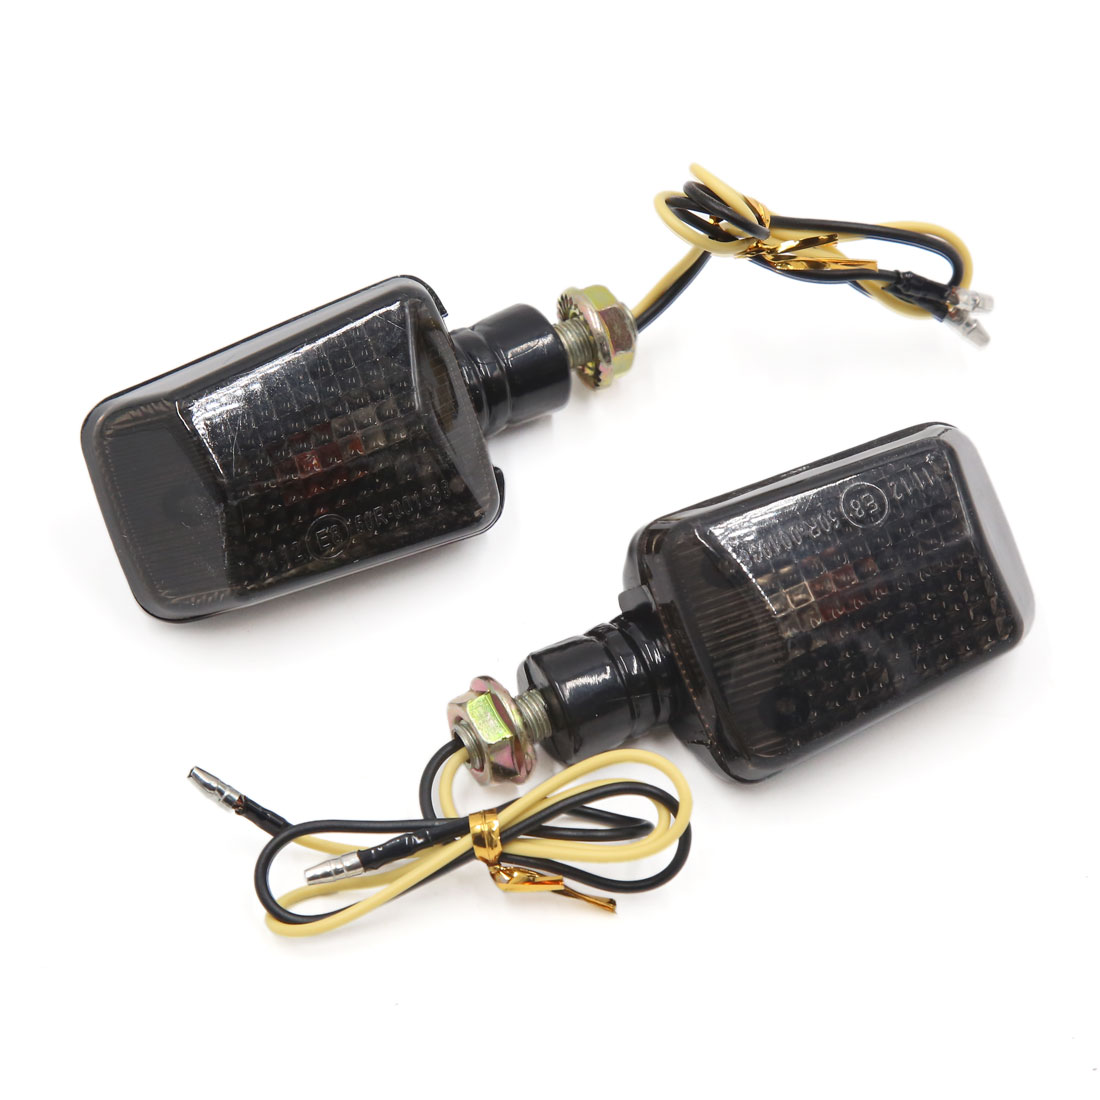 2pcs Yellow LED Rectangle Shape Turn Signal Blinker Light Indicator Lamp for Motorcycle